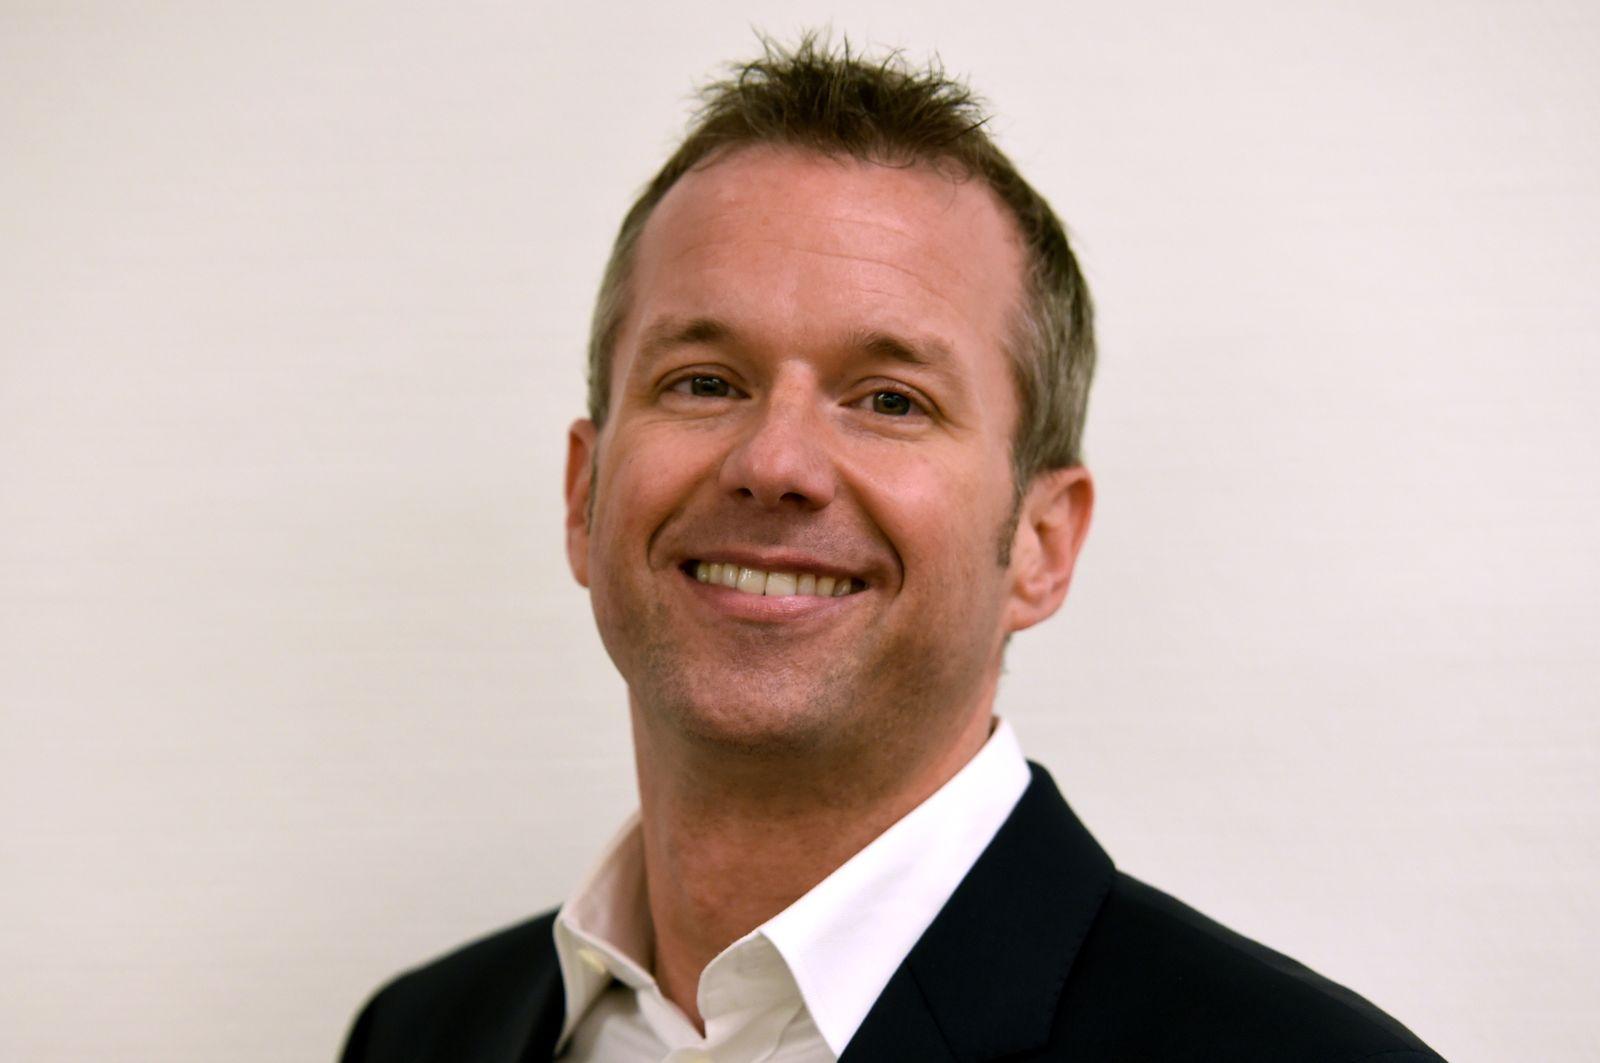 Neuer Bürgermeister von Sylt - Nikolas Häckel